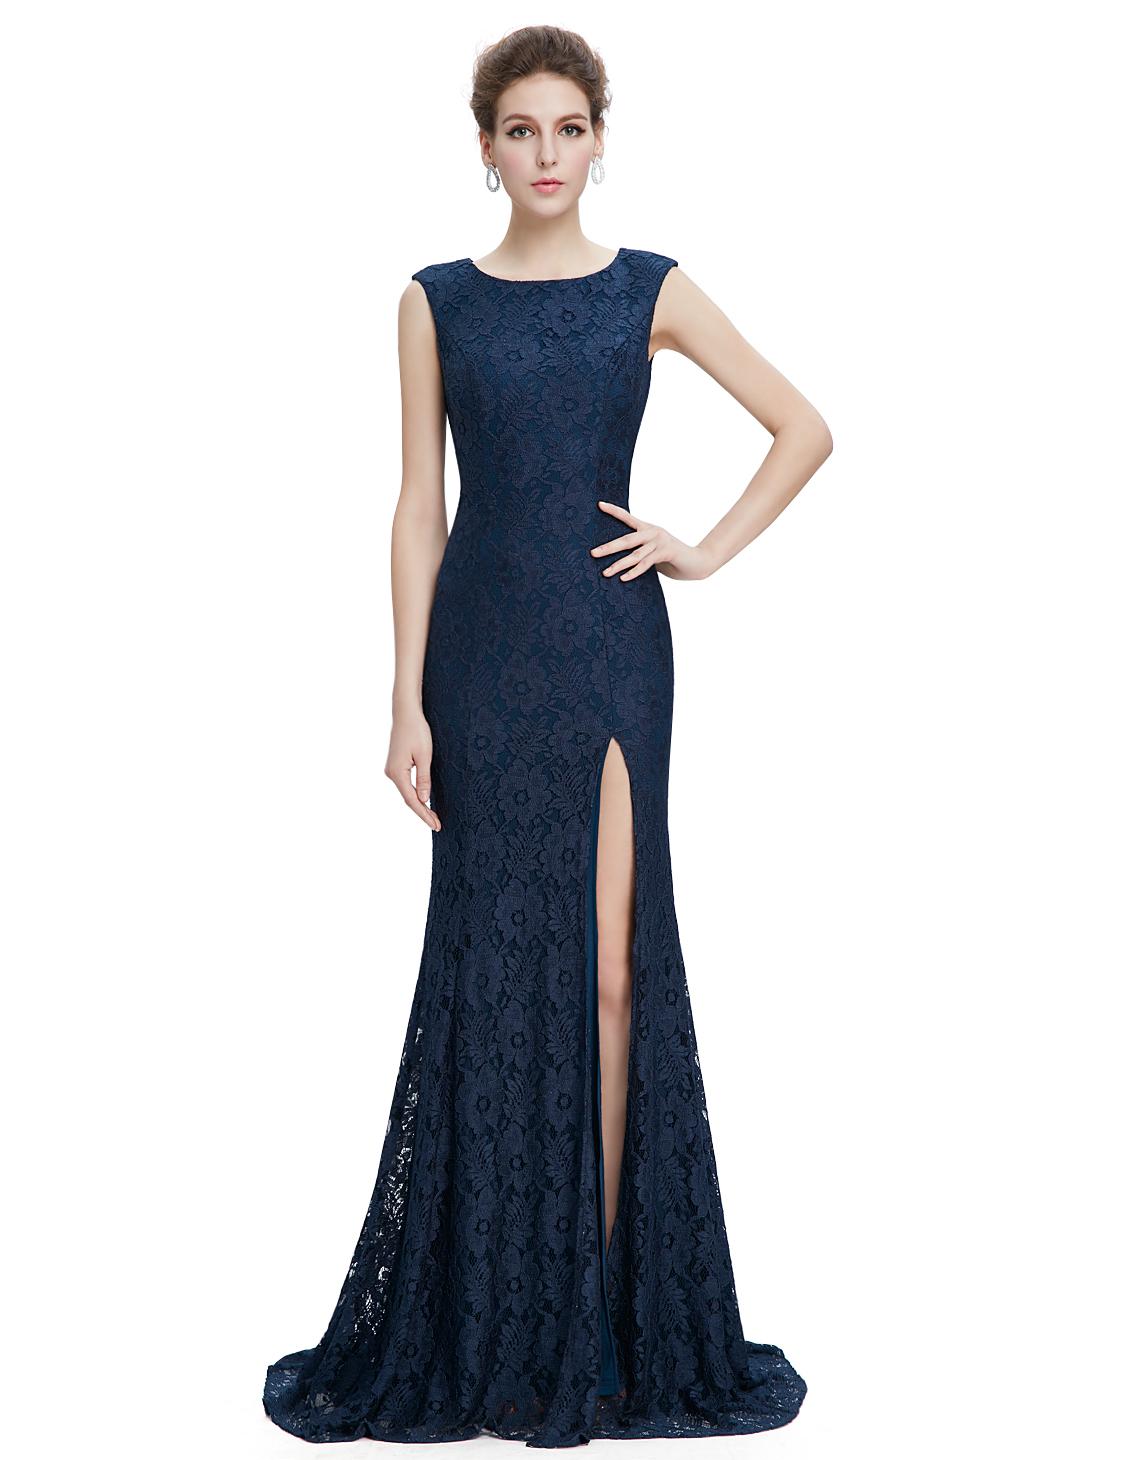 Ebay Evening Gowns Size 18 - Eligent Prom Dresses